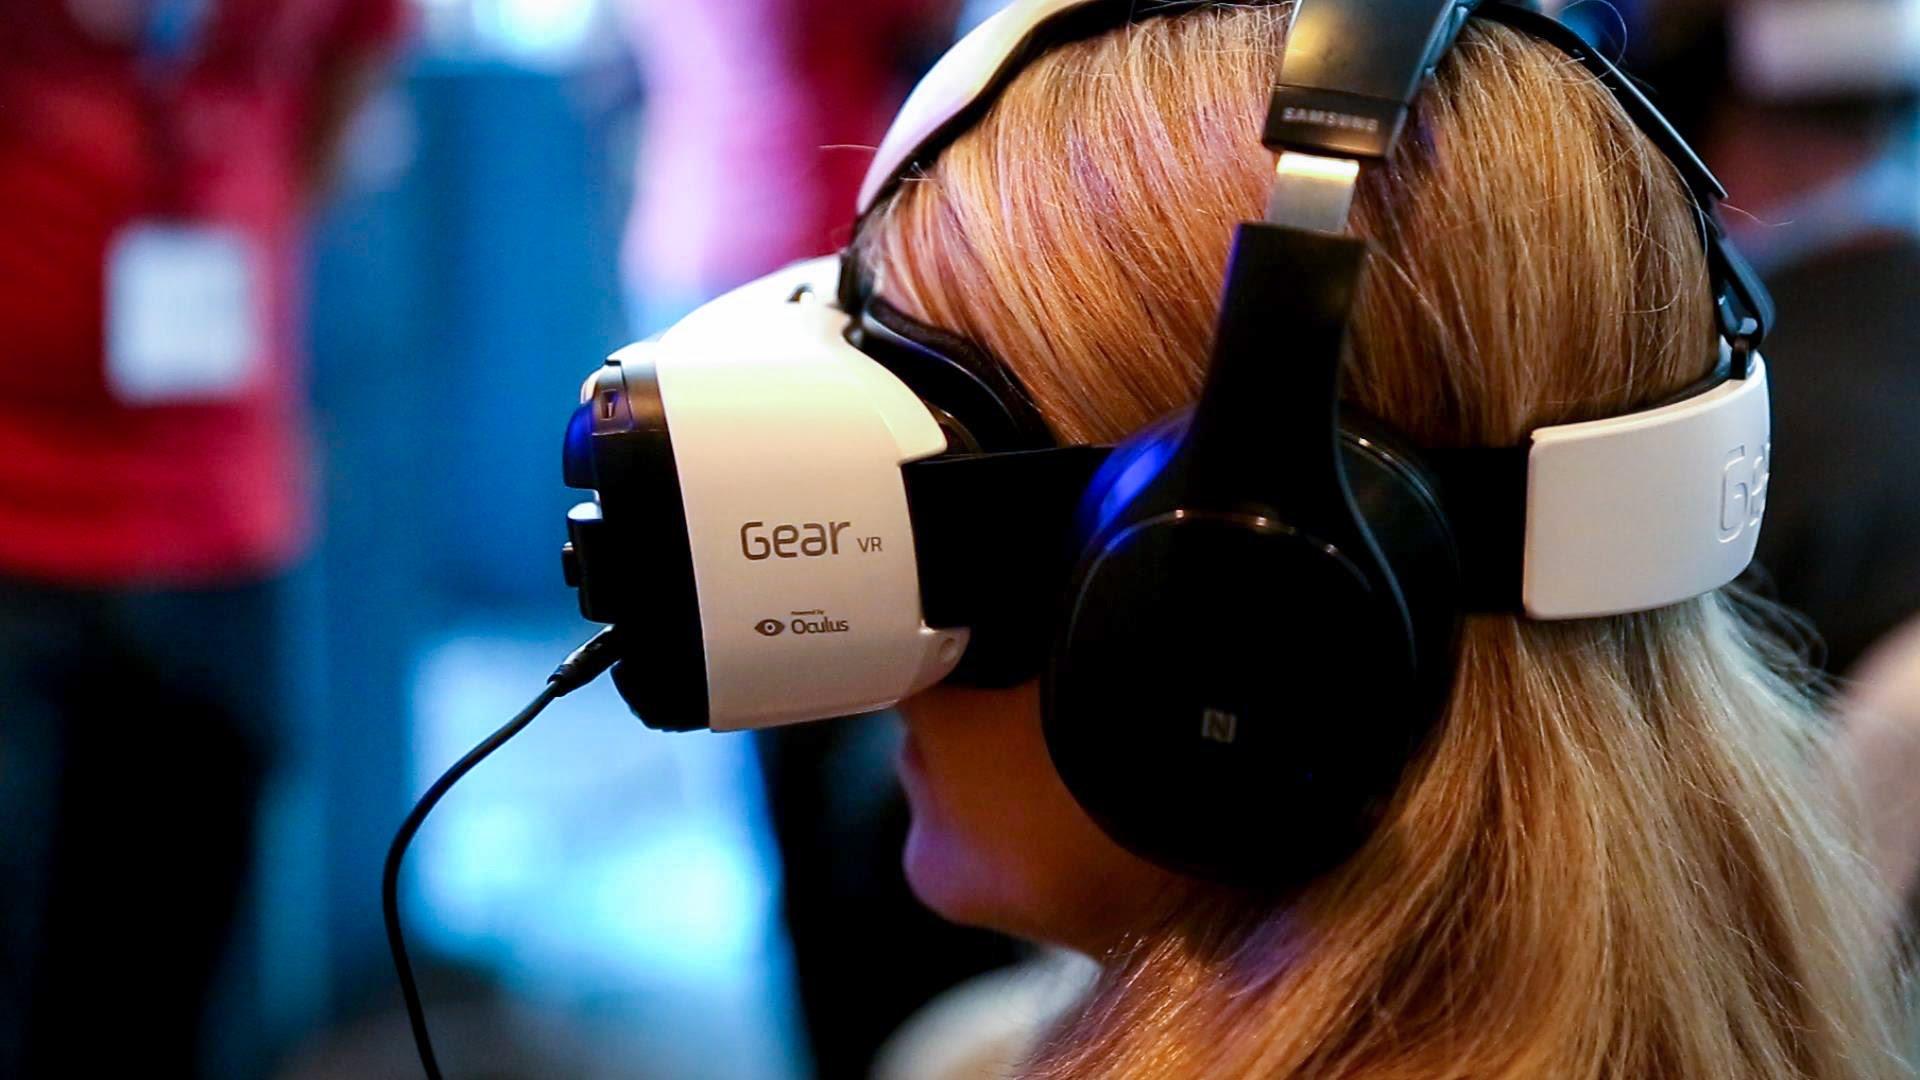 Oculus Gear VR Samsung, realtà virtuale a soli 99 dollari